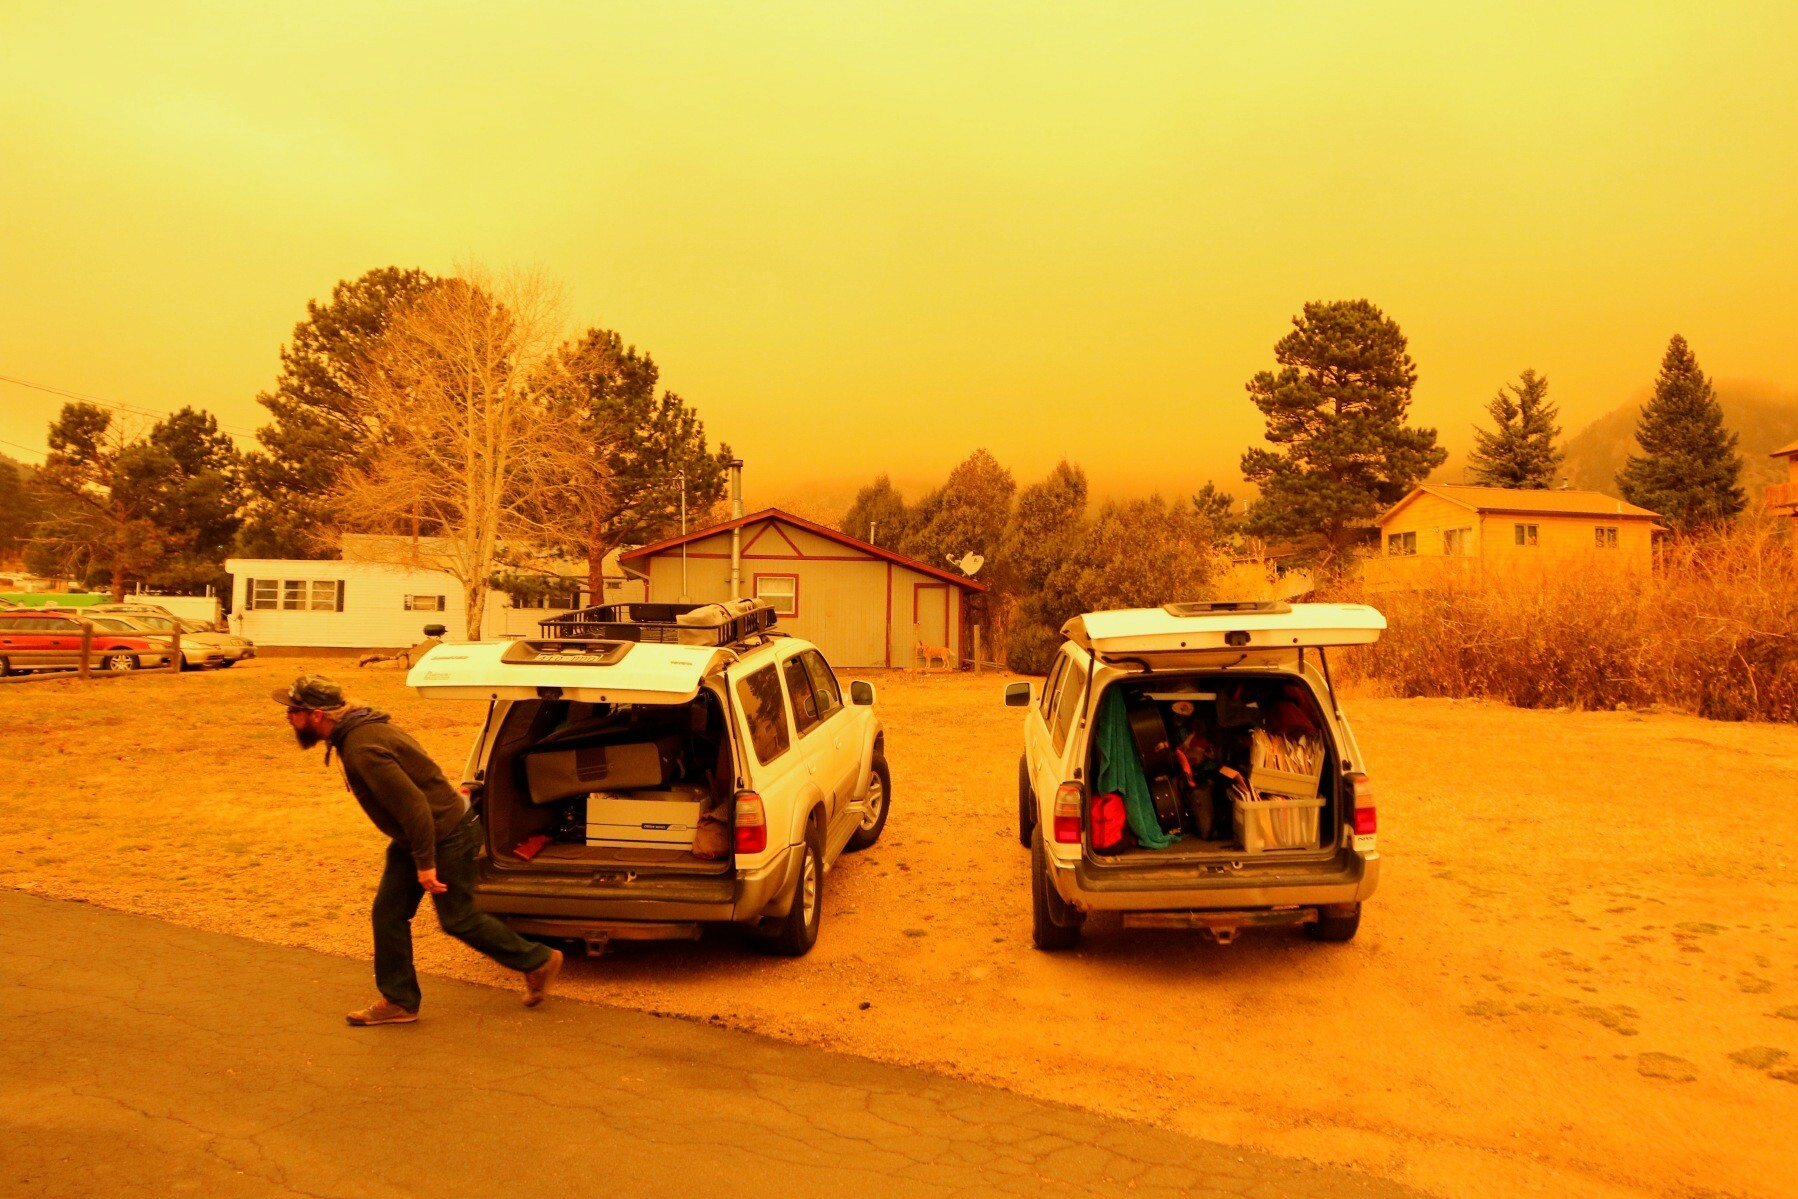 Jeremy Johnston evacuates from Estes Park on Thursday, Oct. 22.